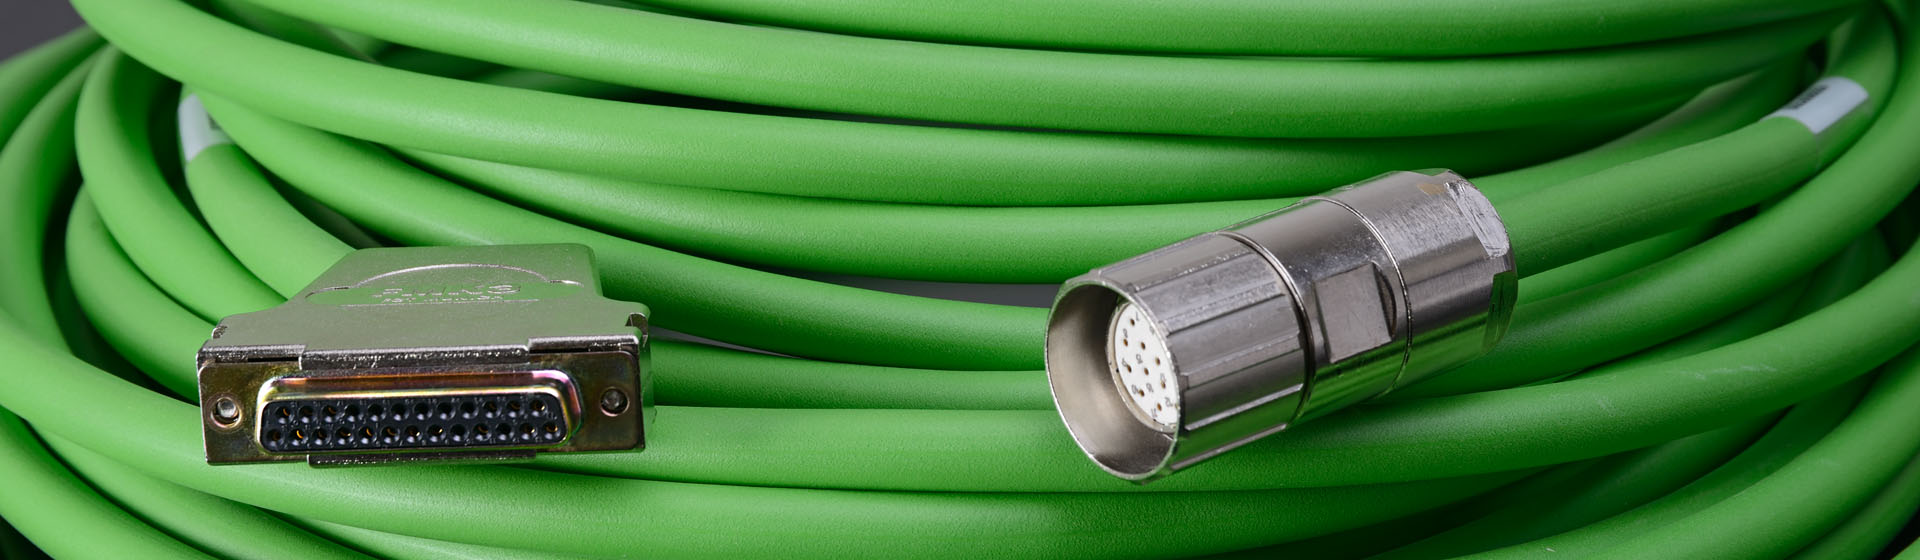 BNC+Elbis-slide_0005_cavo-automazione-verde